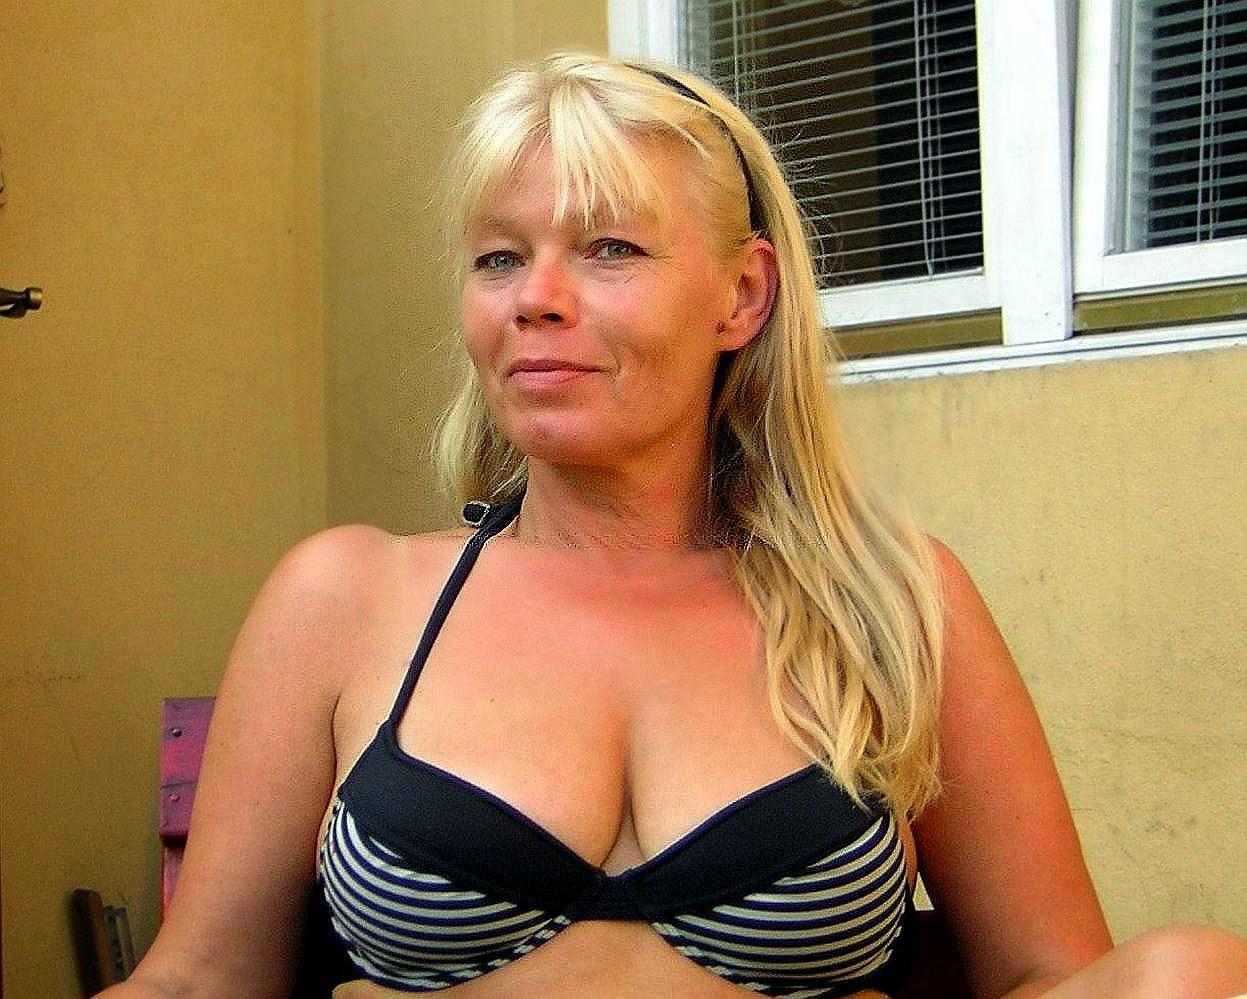 Tiamo 50 Blond Seeking To Woman 55 Man Spanish